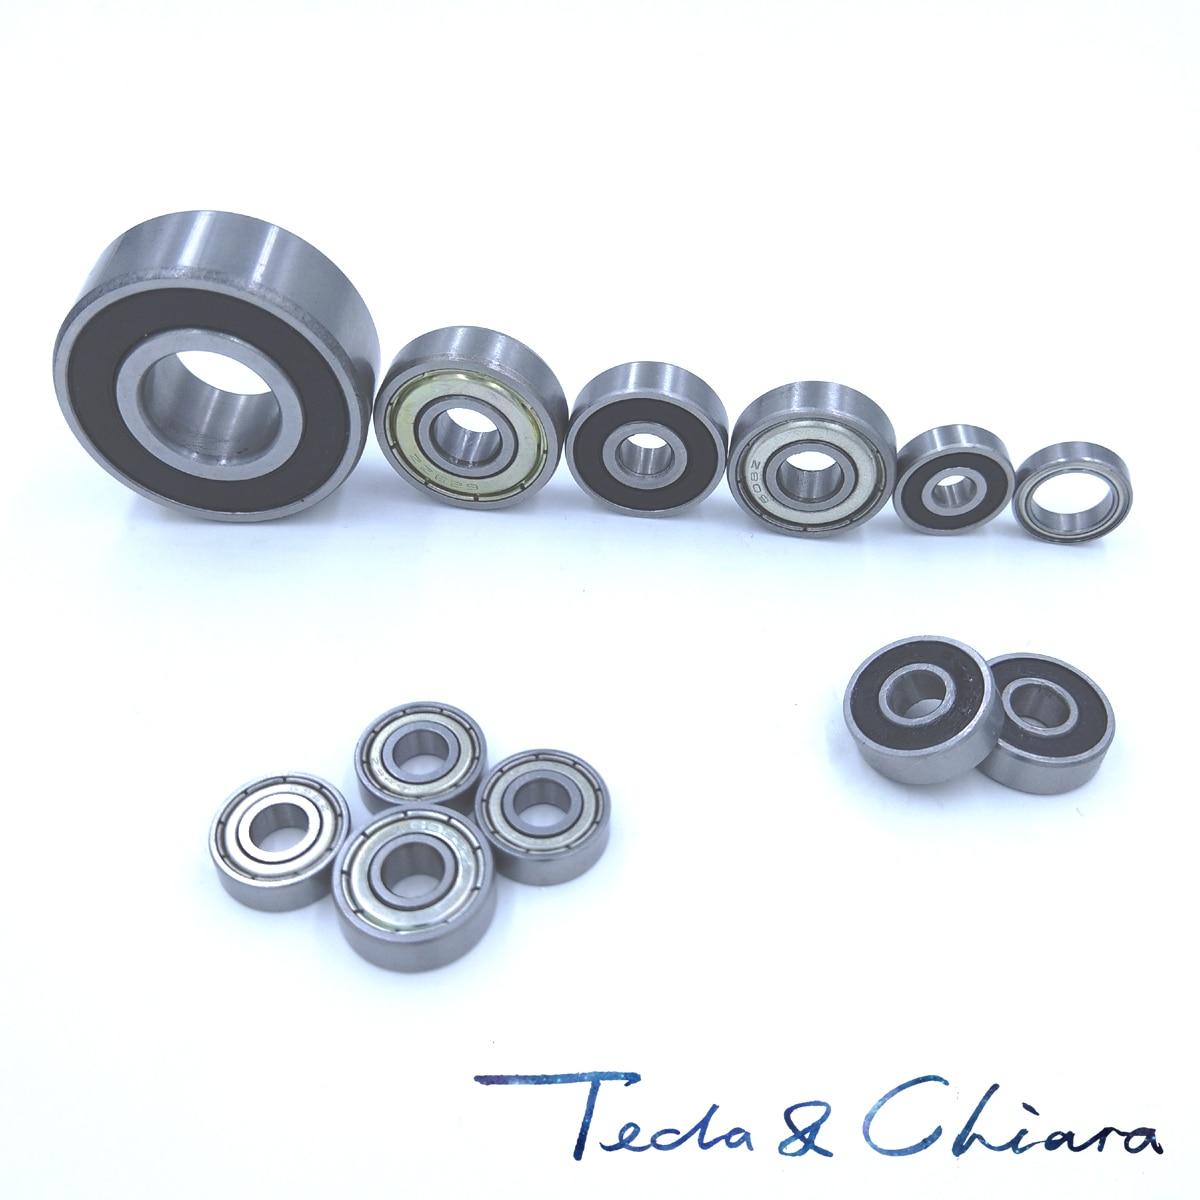 6201 6201ZZ 6201RS 6201-2Z 6201Z 6201-2RS ZZ RS RZ 2RZ los rodamientos de bolas de ranura profunda 12x32x10mm